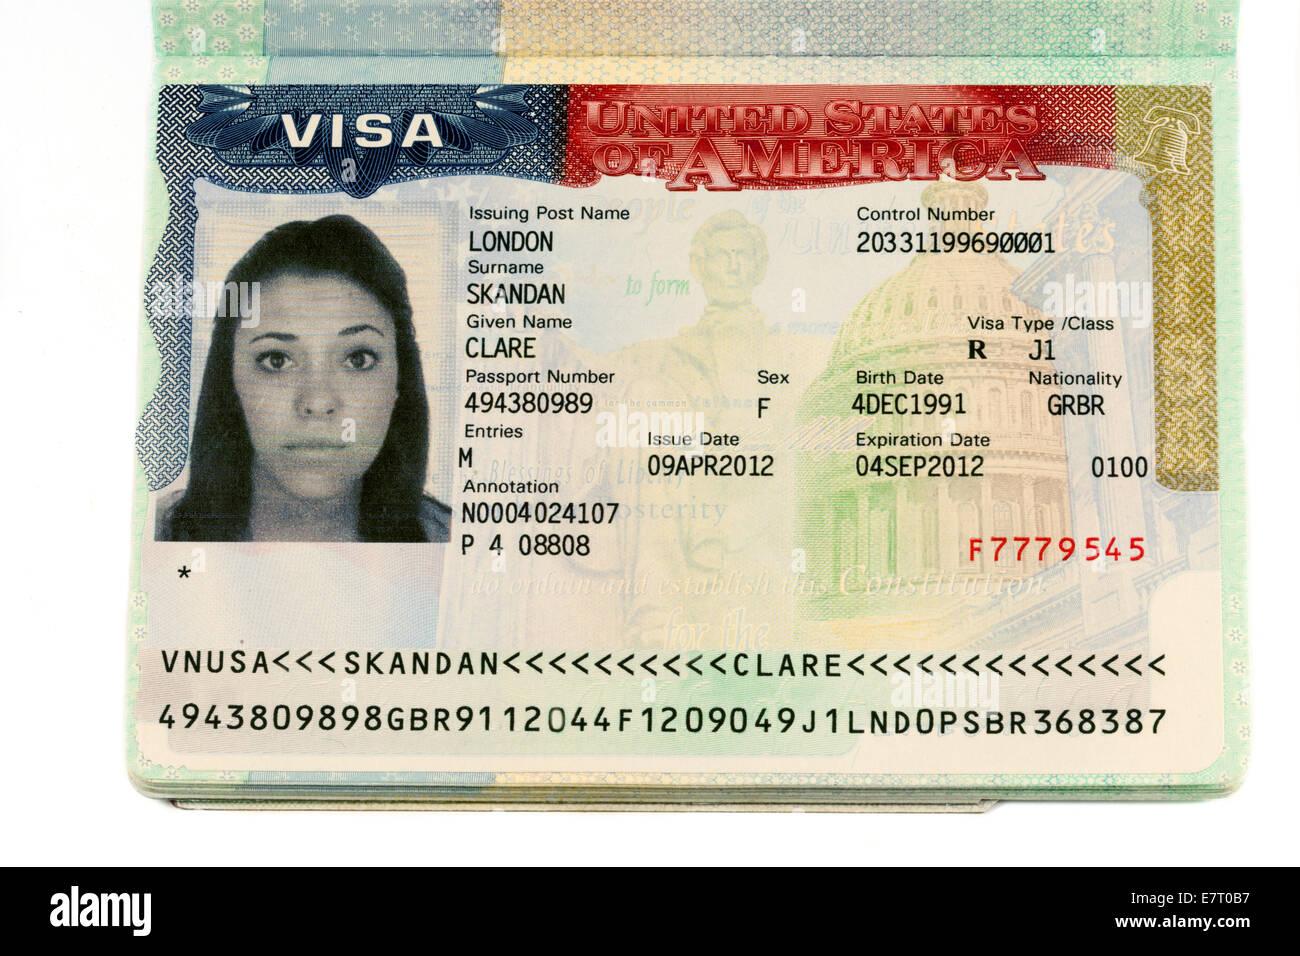 cual es el travel document number